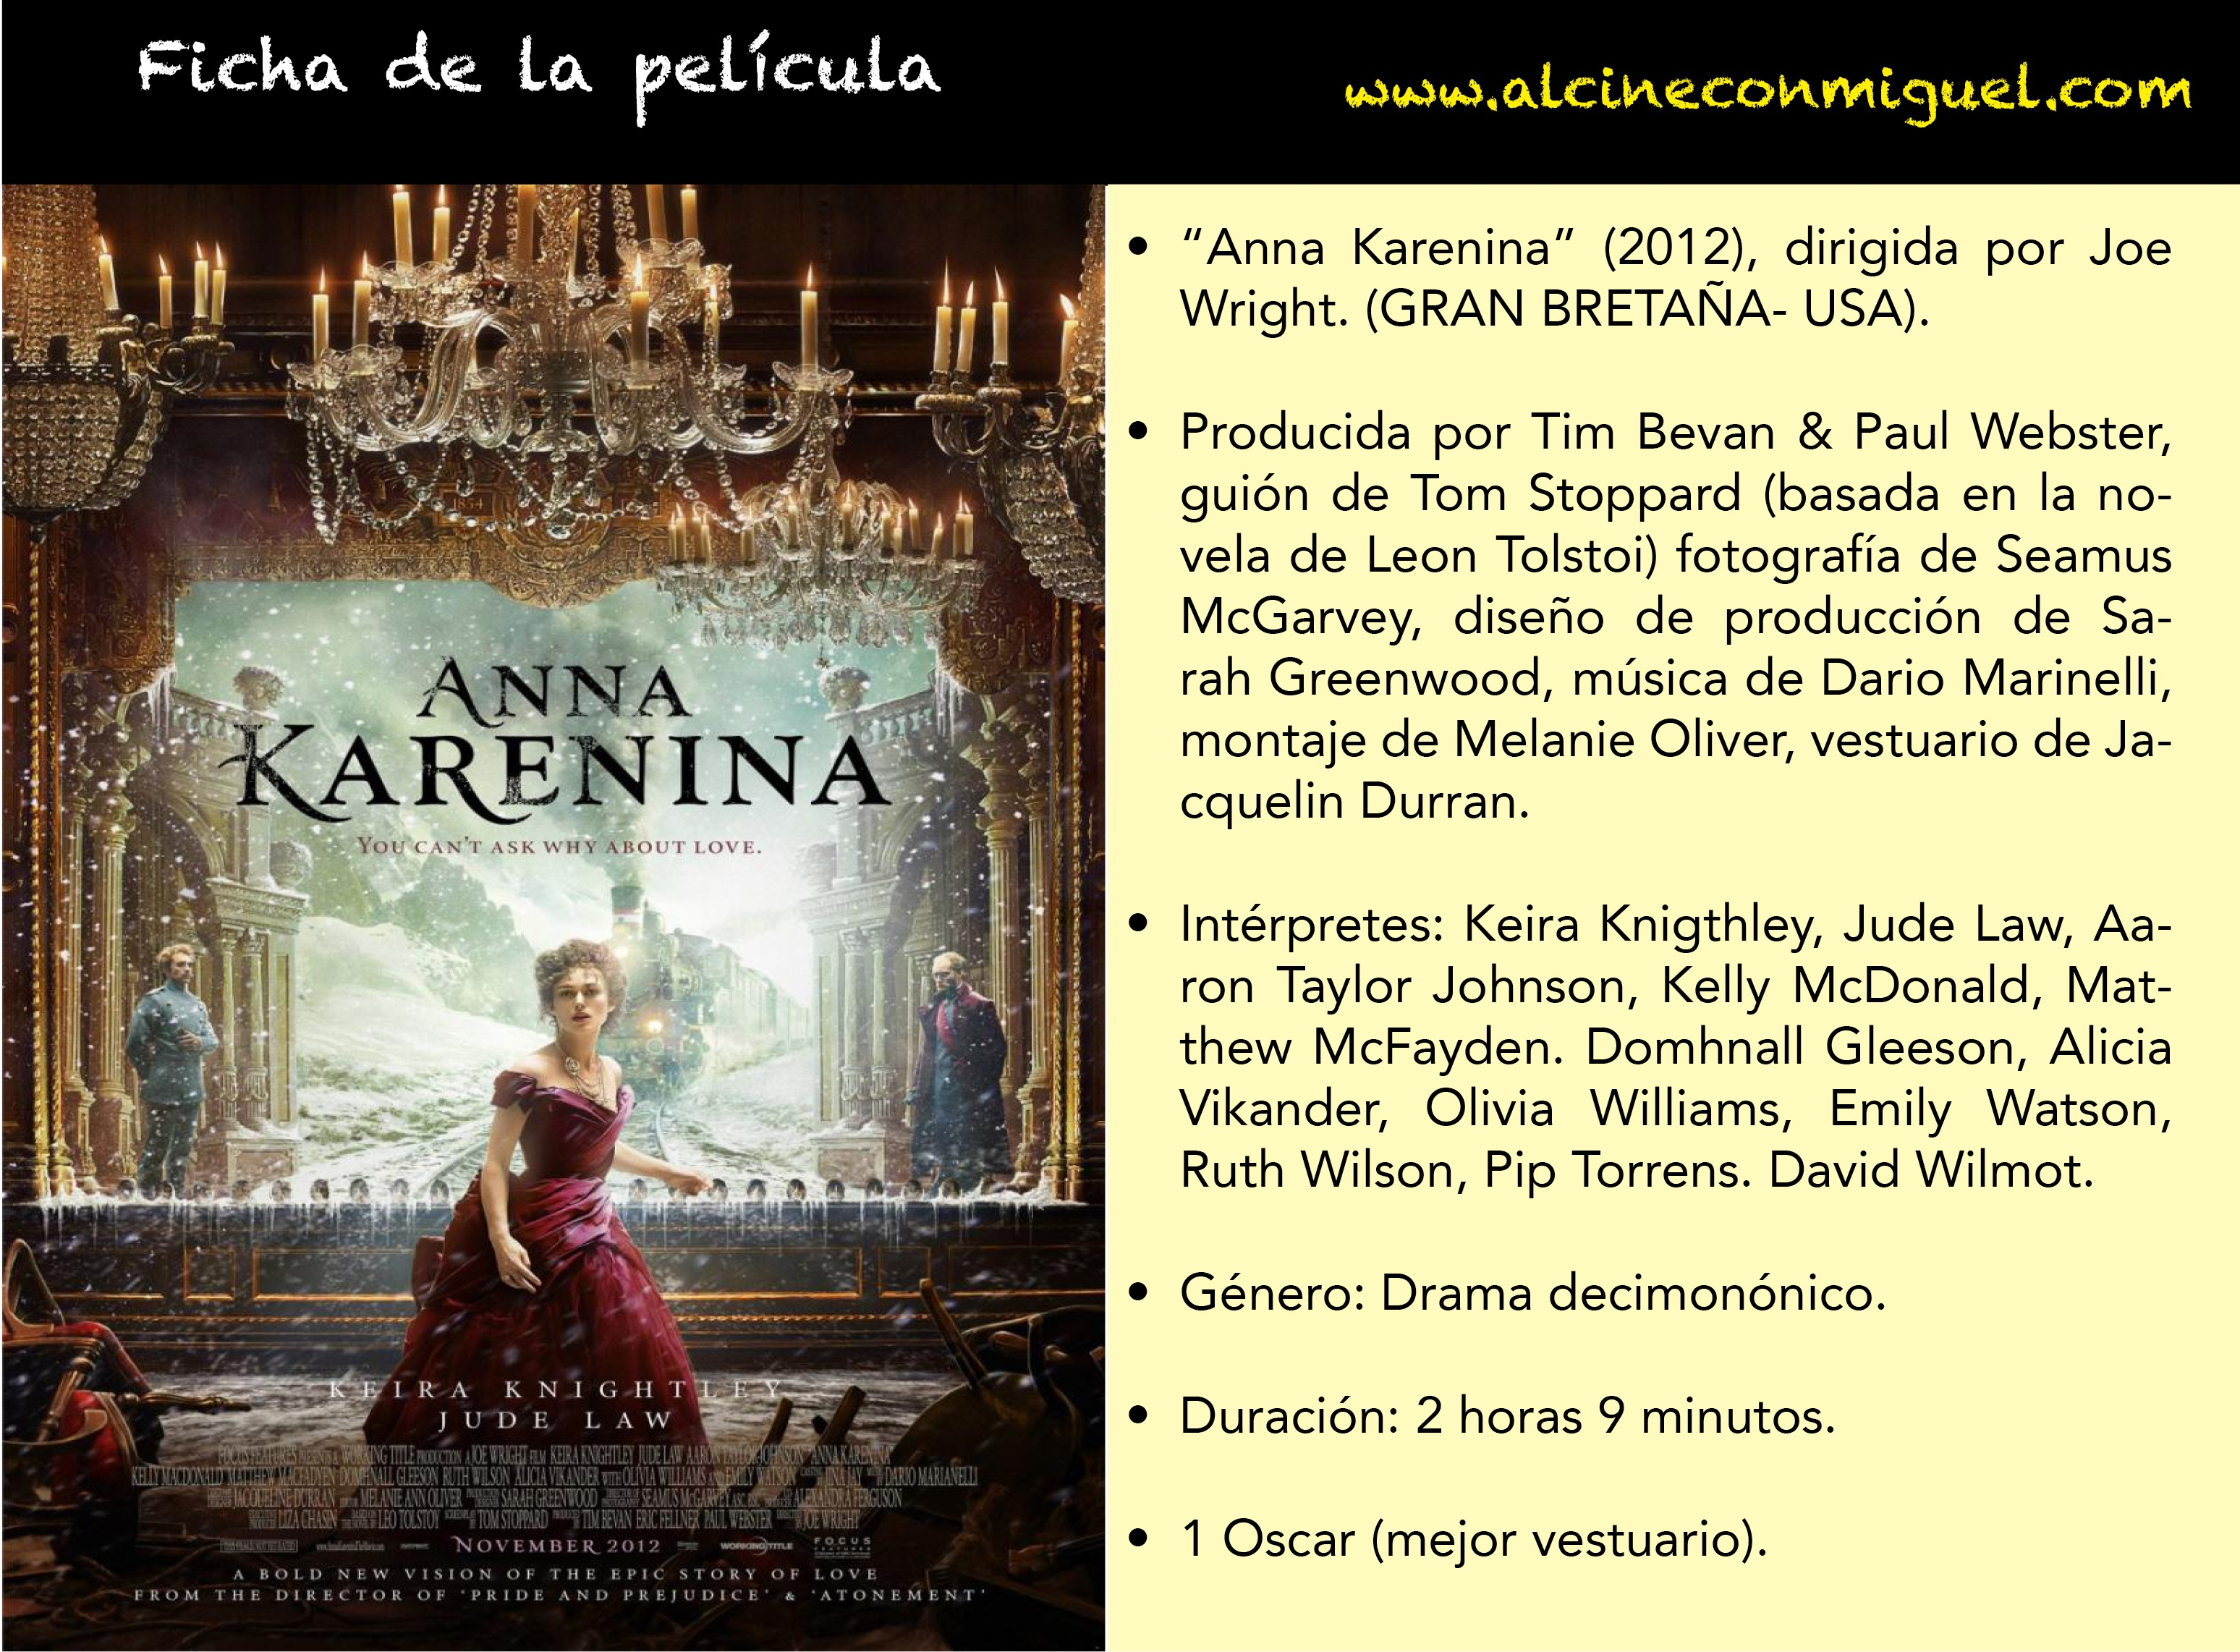 últimos Estrenos Ana Karenina De Joe Wright Al Cine